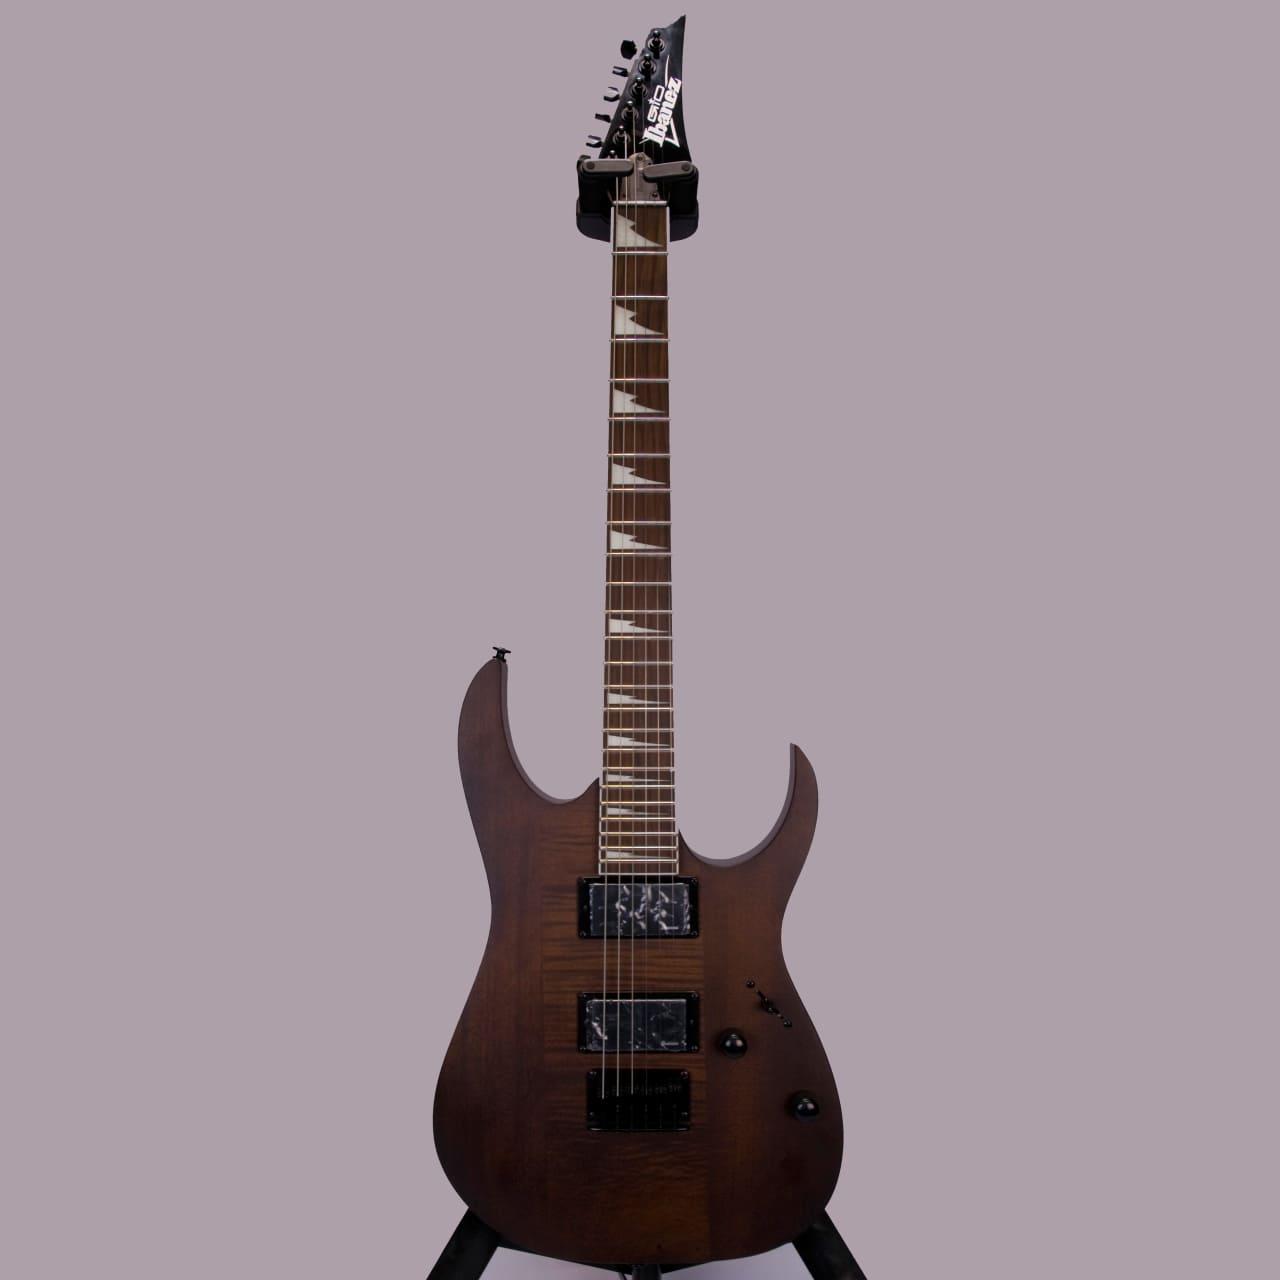 Contemporary Ibanez Gio Electric Guitar Schematics Wiring Diagrams ...